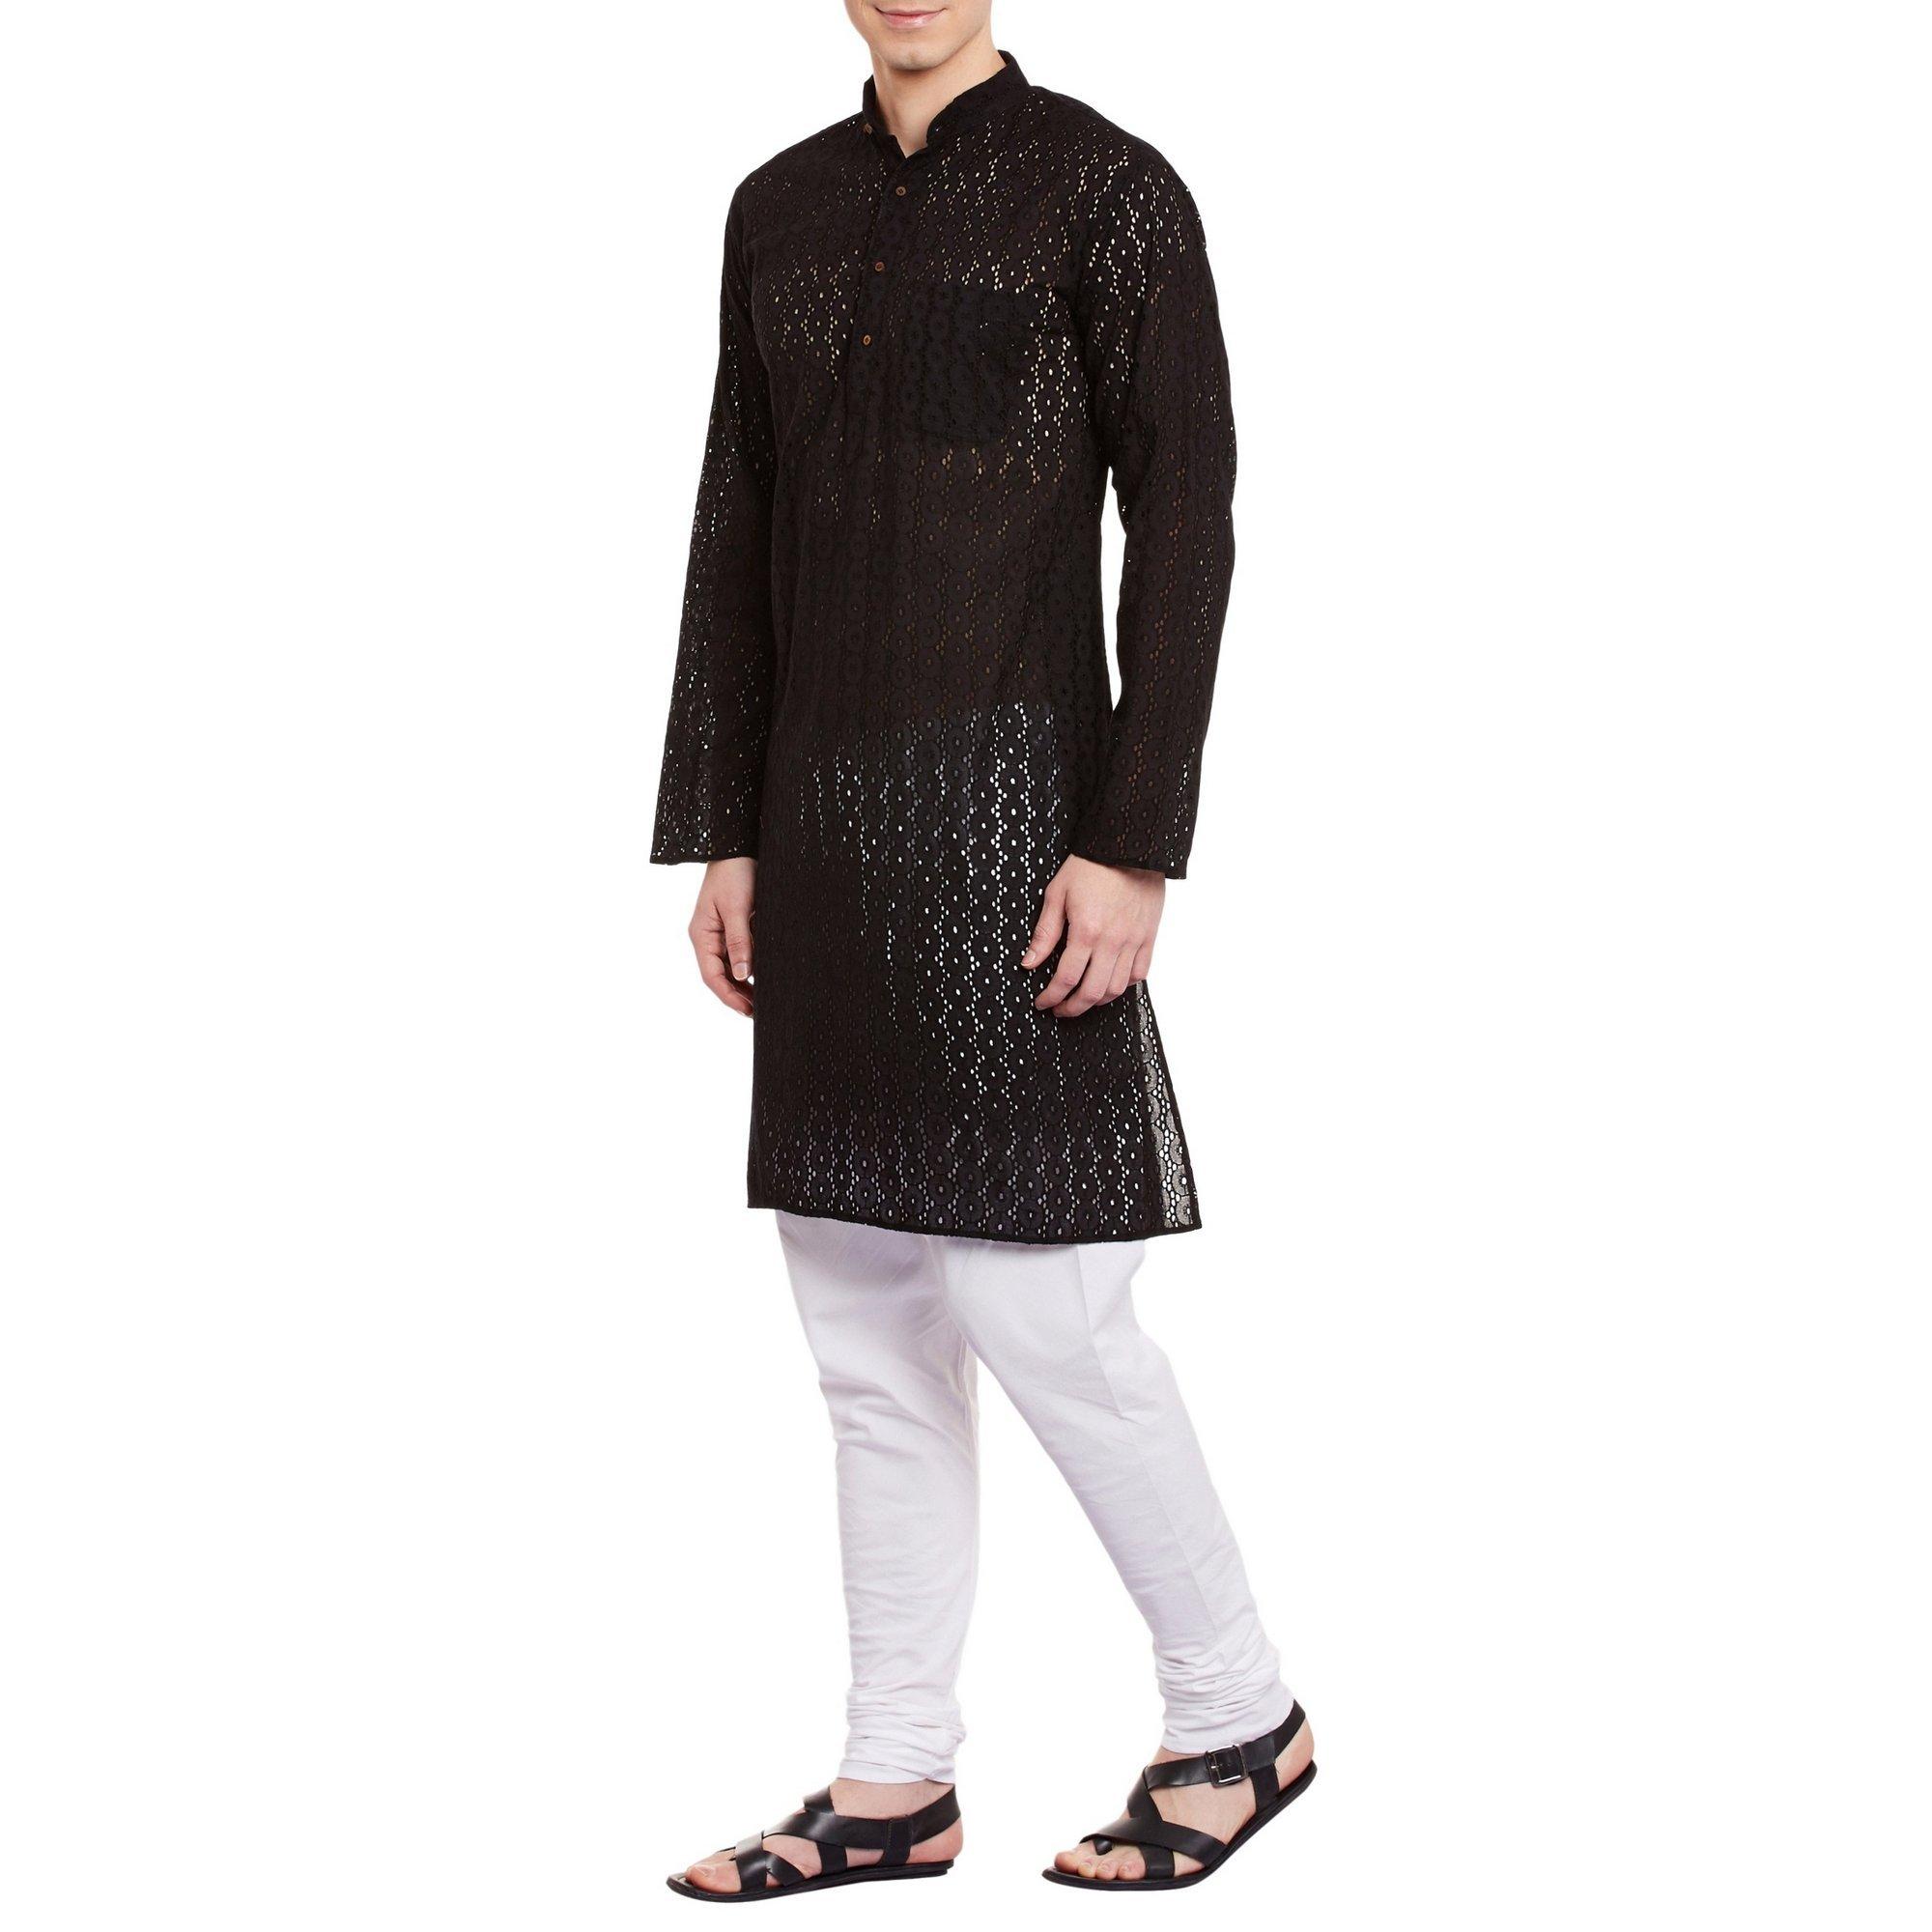 ShalinIndia Mens Embroidered Cutwork Cotton Kurta With Churidar Pajama Trousers Machine Embroidery,Black Chest Size: 40 Inch by ShalinIndia (Image #3)